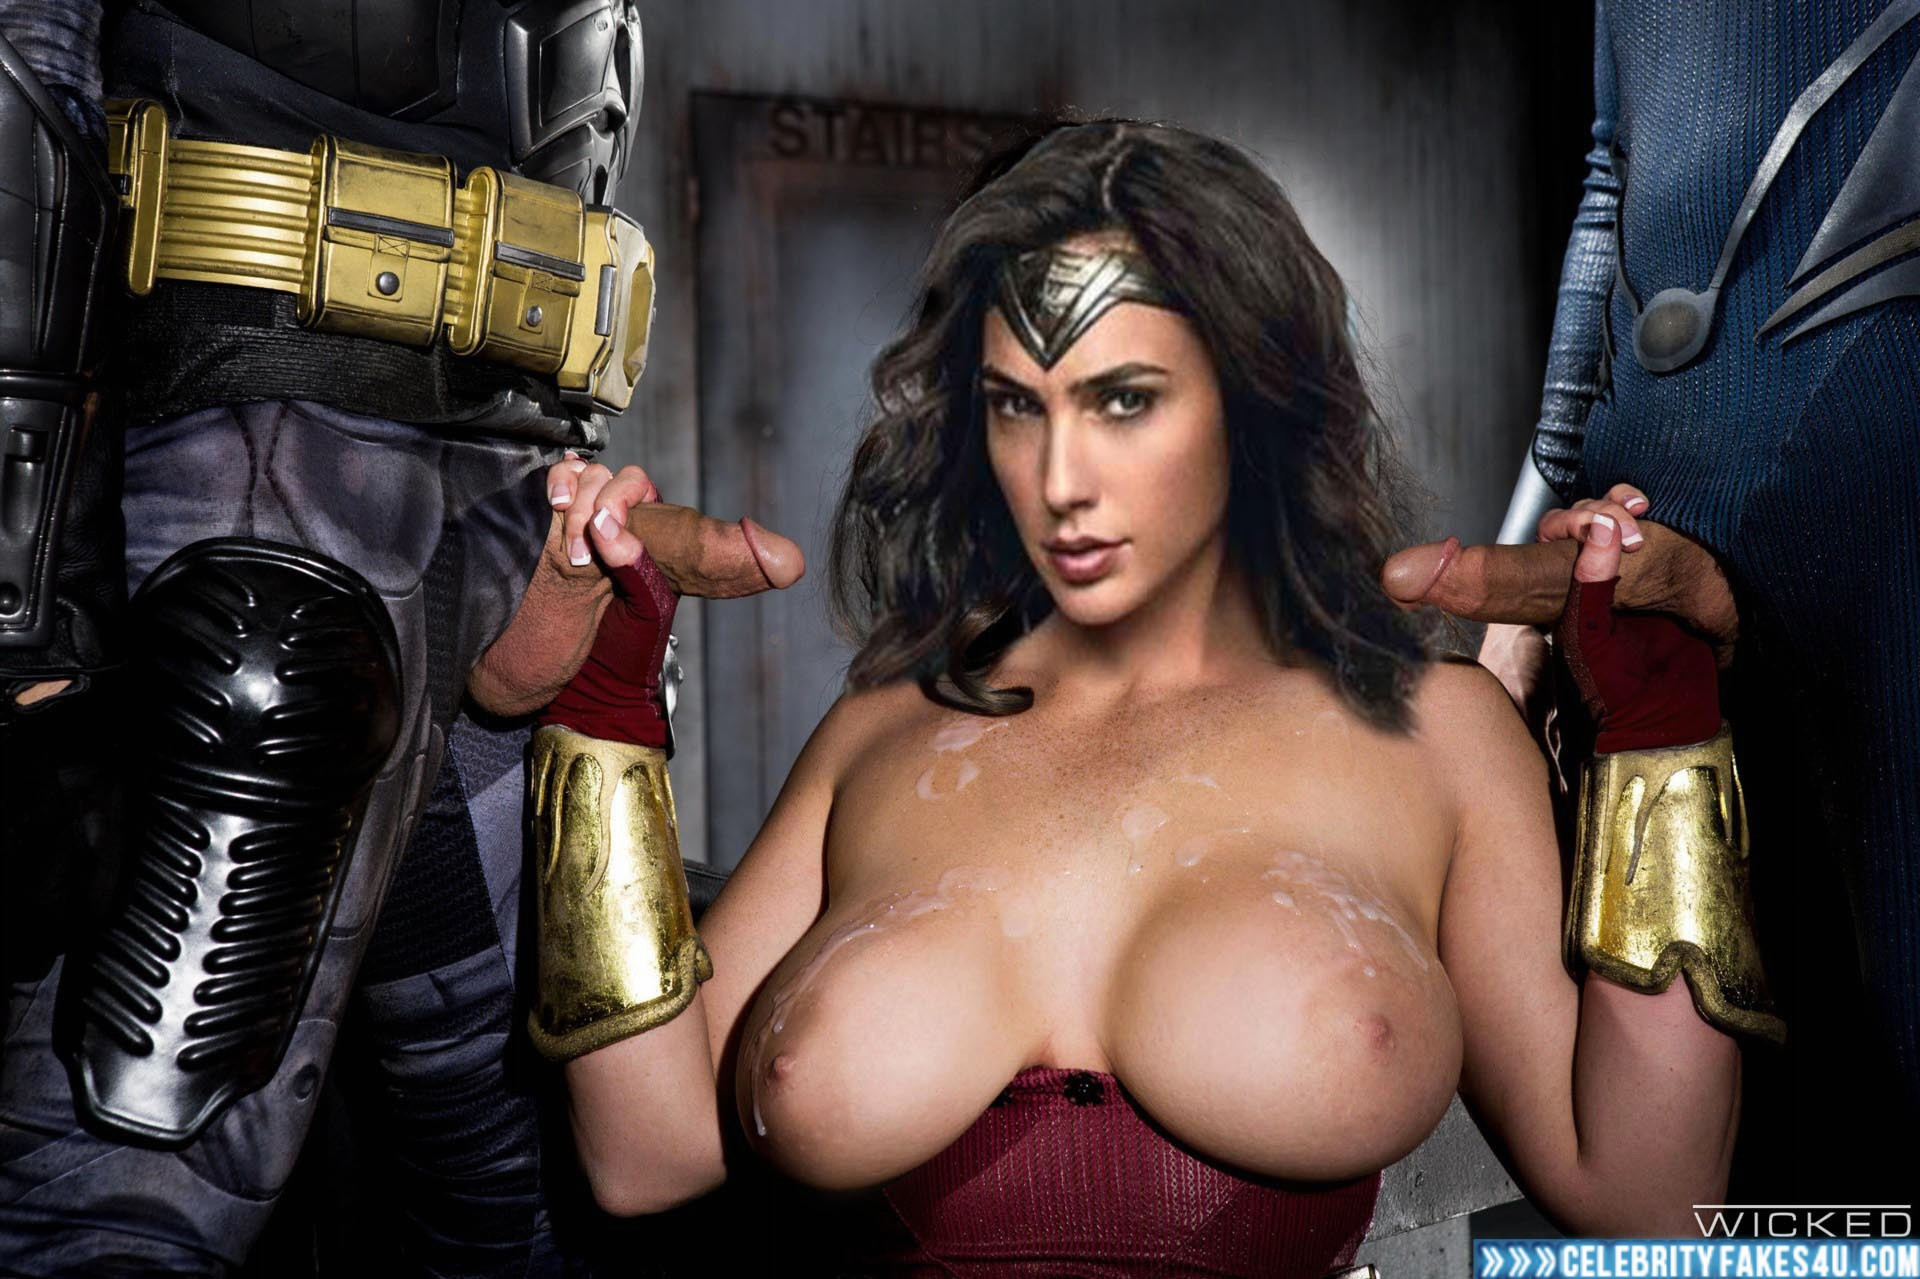 Gal Gadot Fake, Big Tits, Cumshot, Gangbang, Handjob, Justice League, Series, Sex, Tits, Wonder Woman, Porn